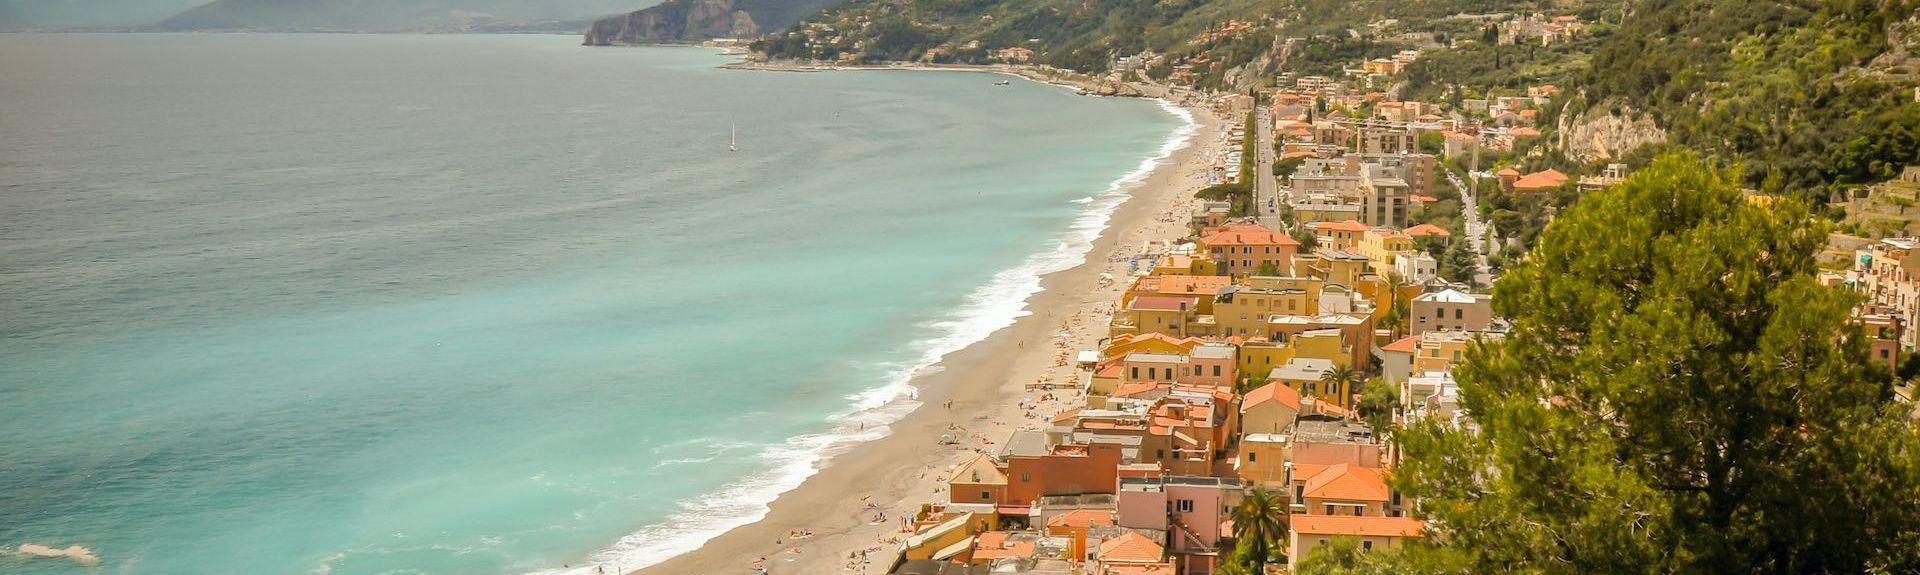 Savona (province), Liguria, Italy